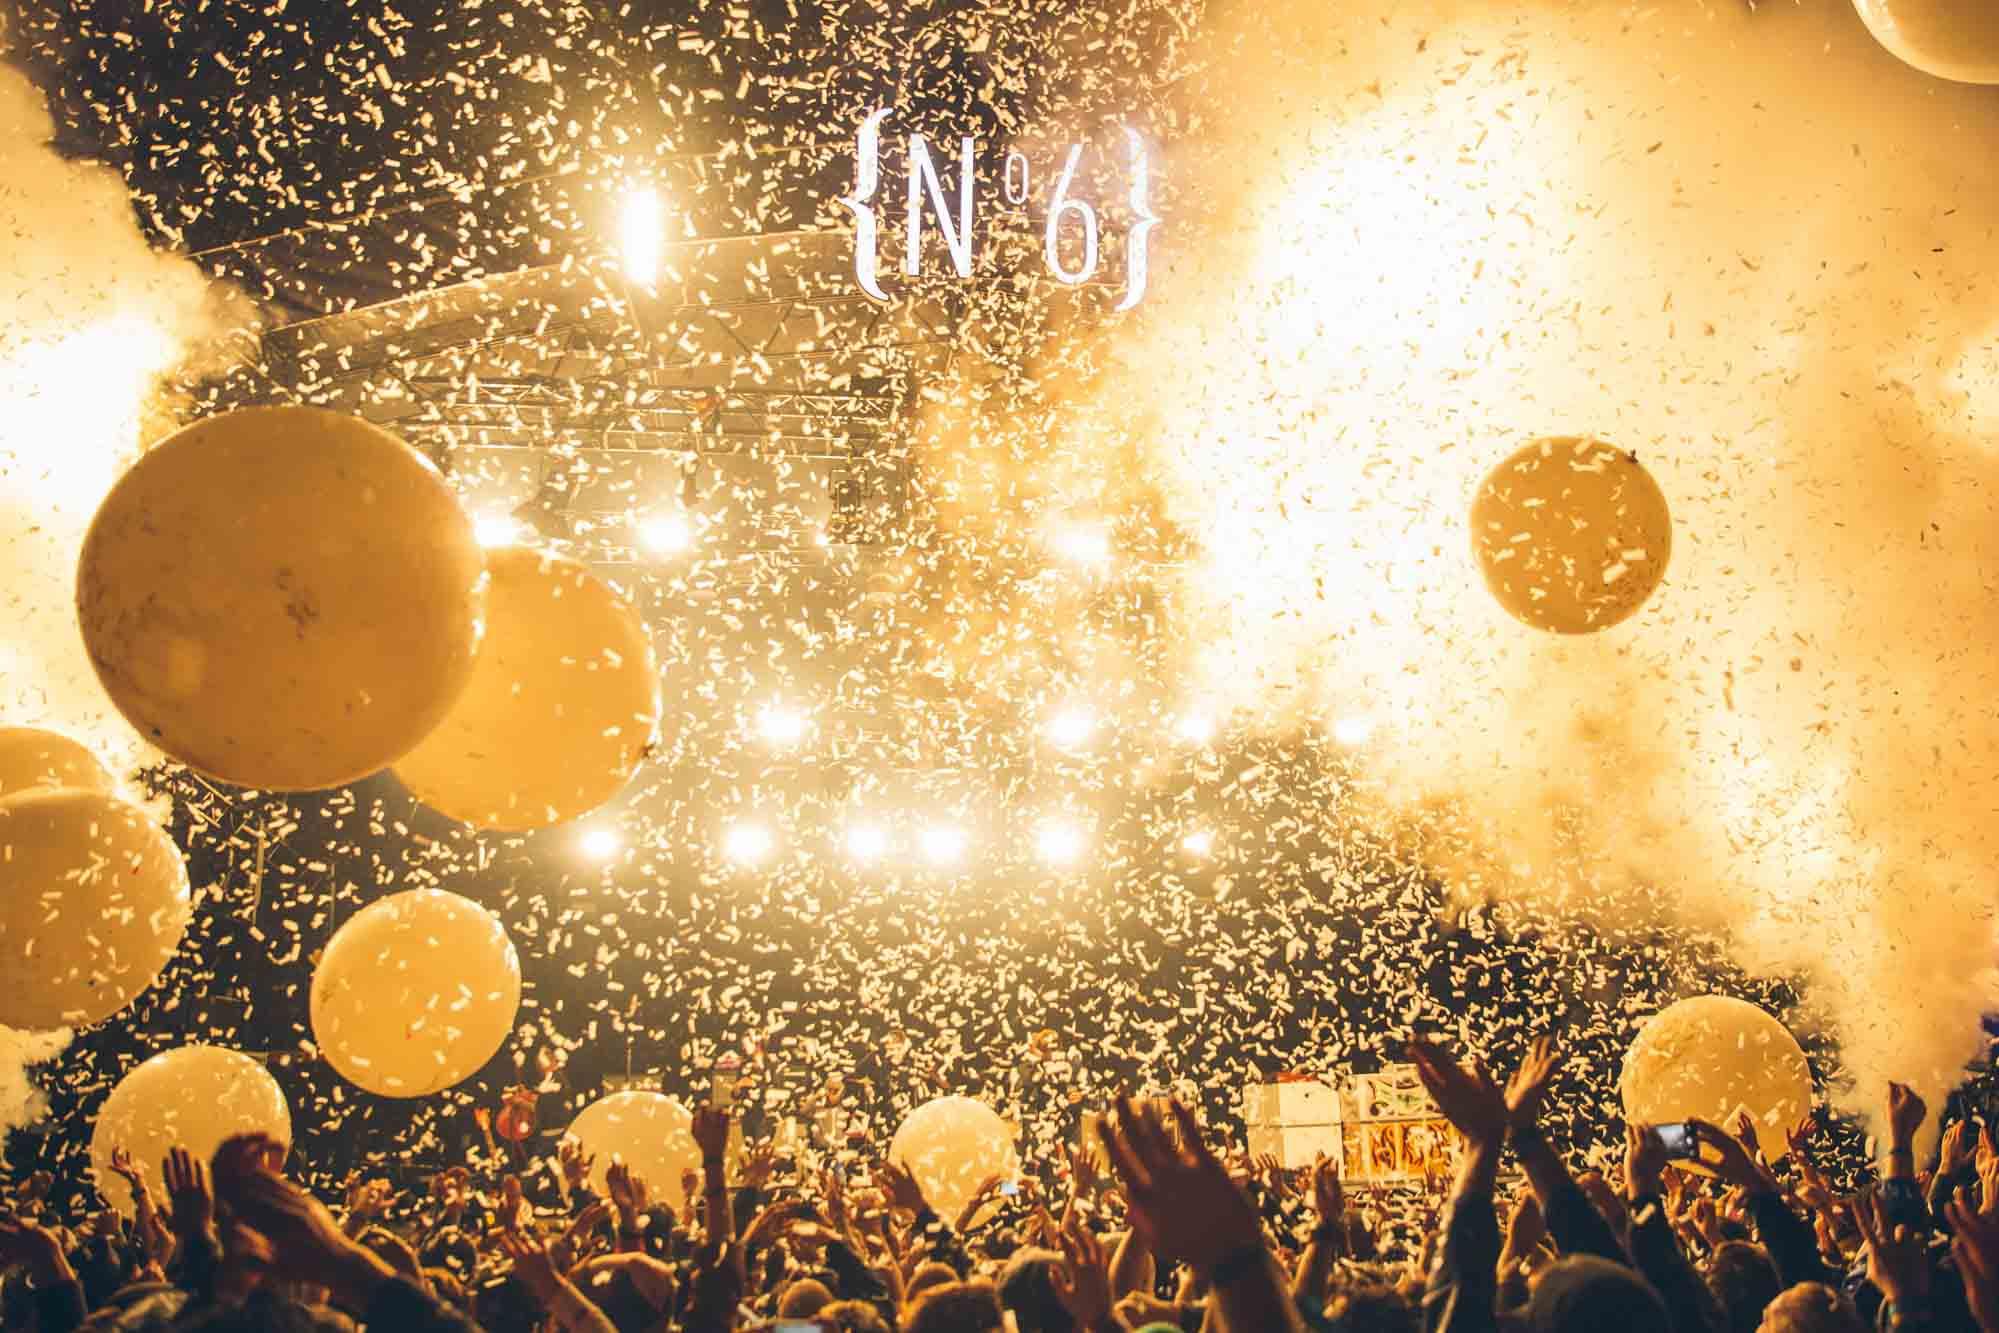 Festival No.6 - Best UK arts festivals